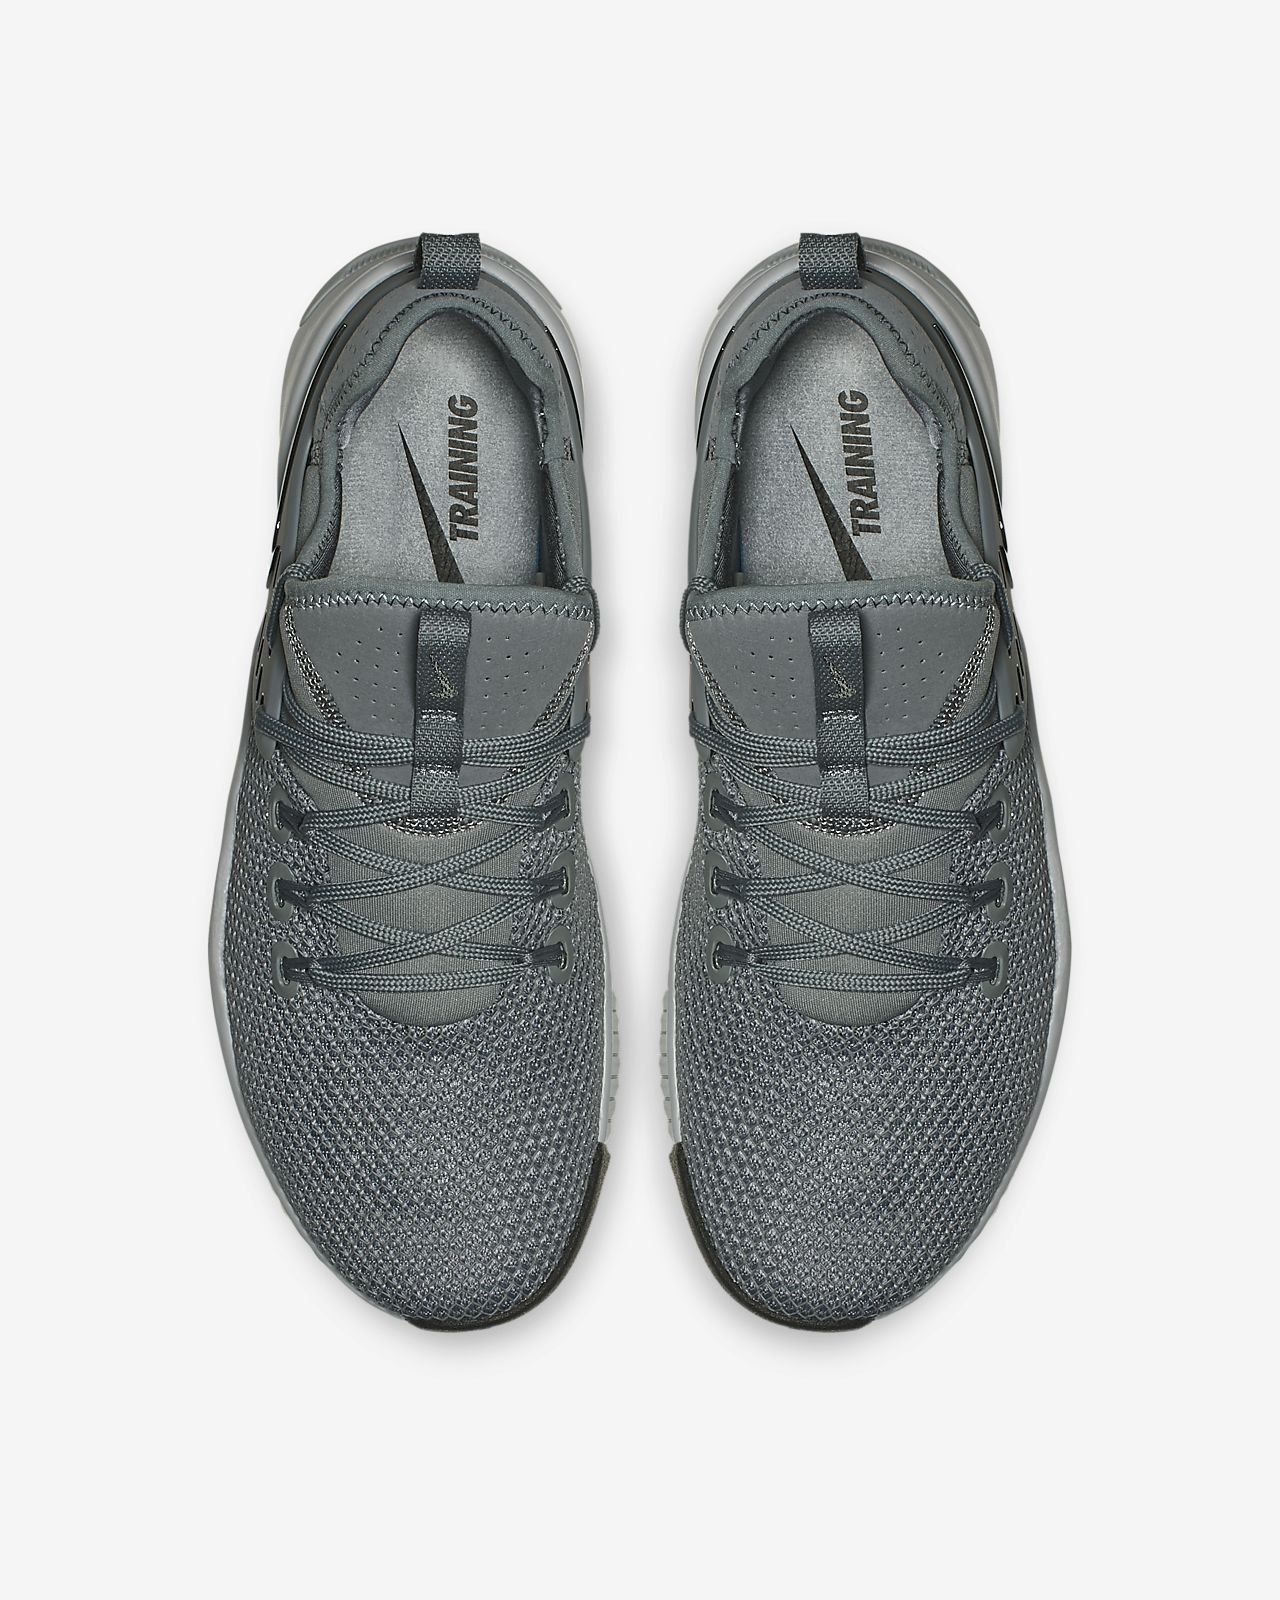 huge discount 2e4bd 9040c Cross Trainingweightlifting Nike Chaussure Metcon Free X qUYIwwXv